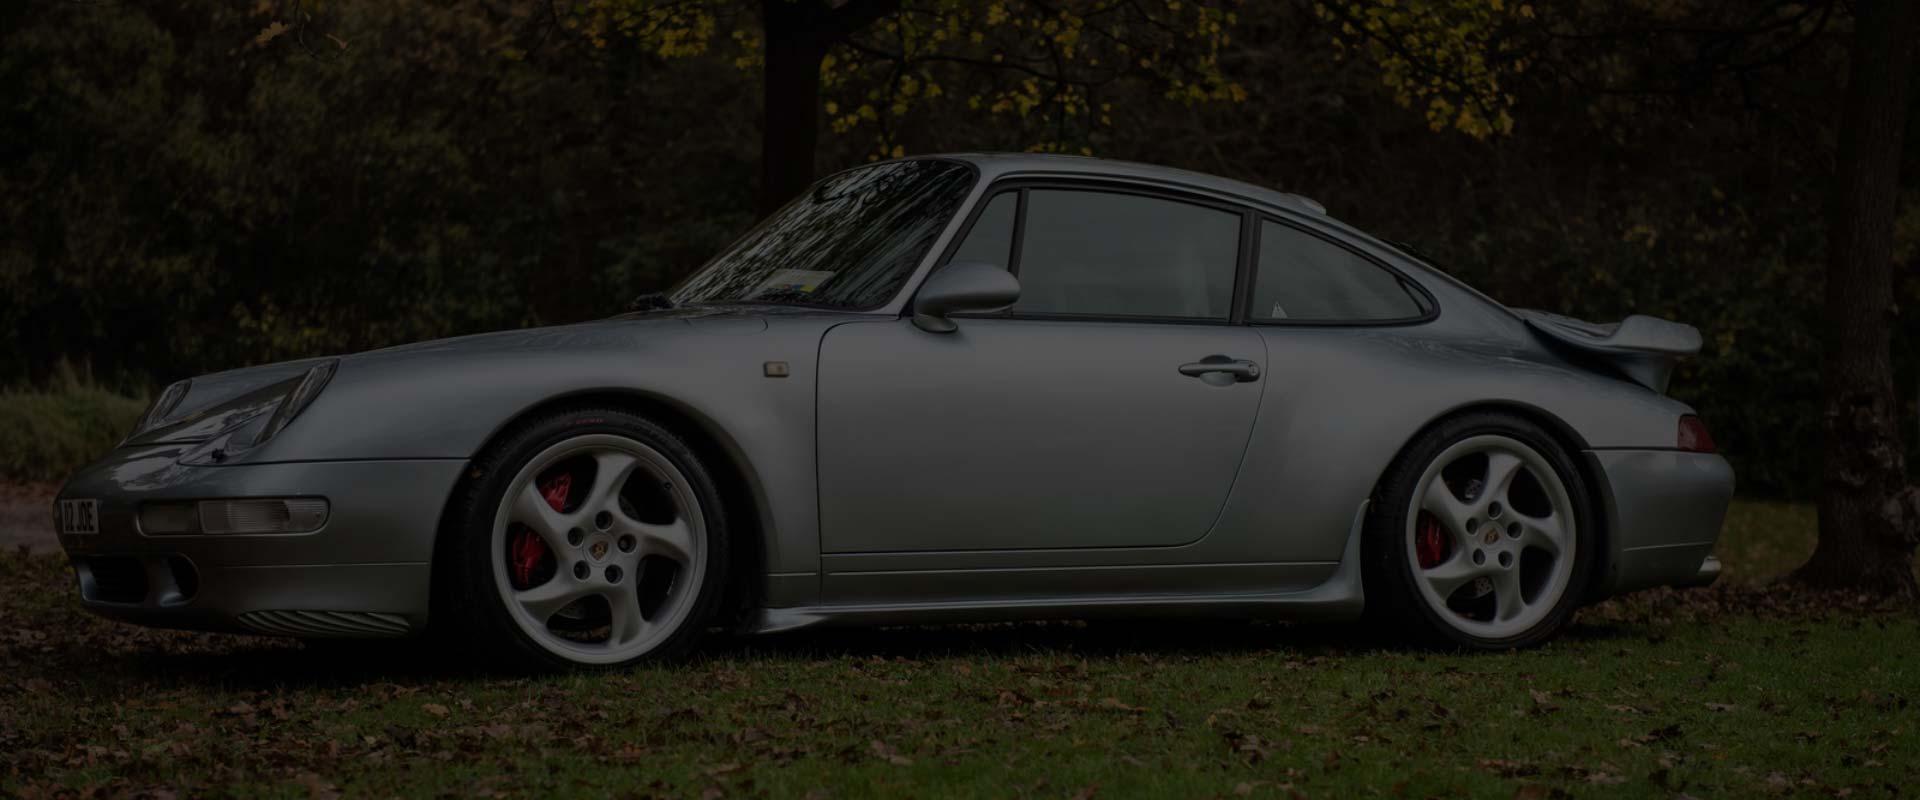 Wedding Cars - Porsche